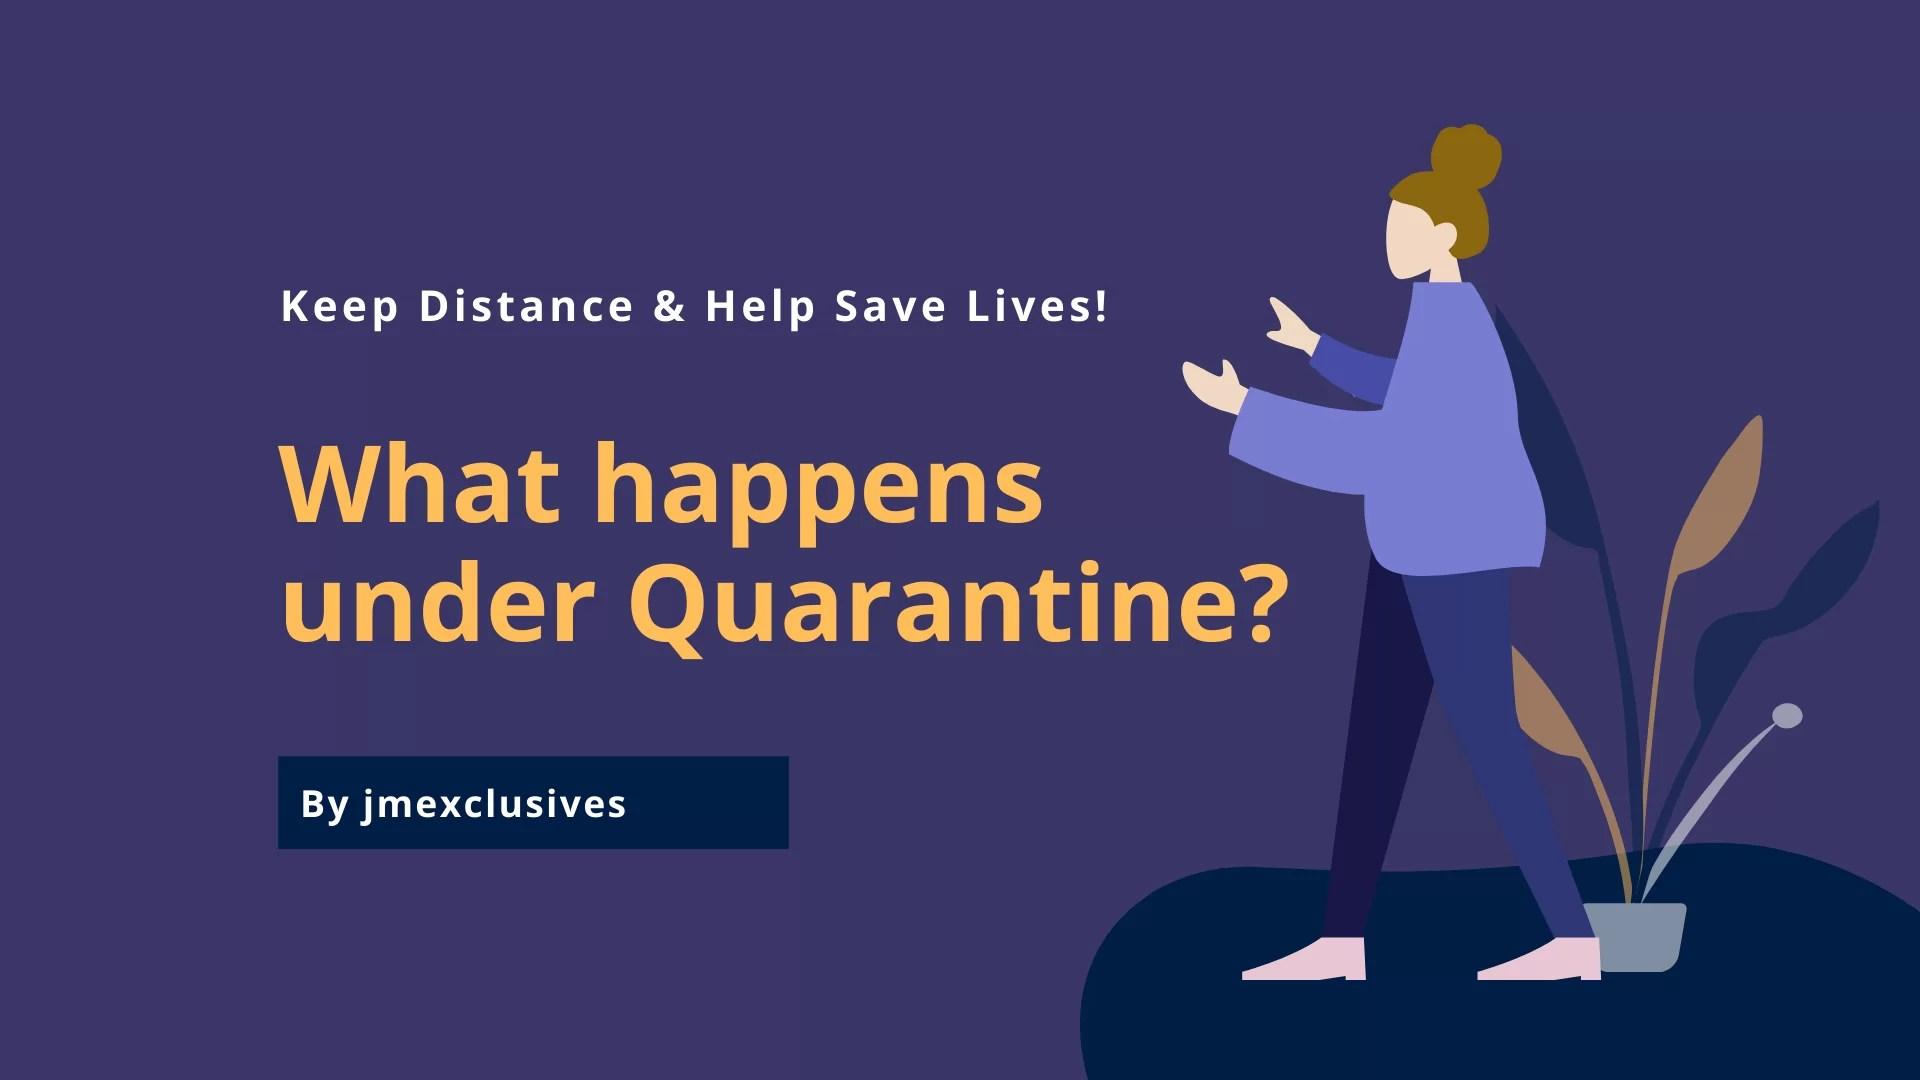 Quarantine and Isolation